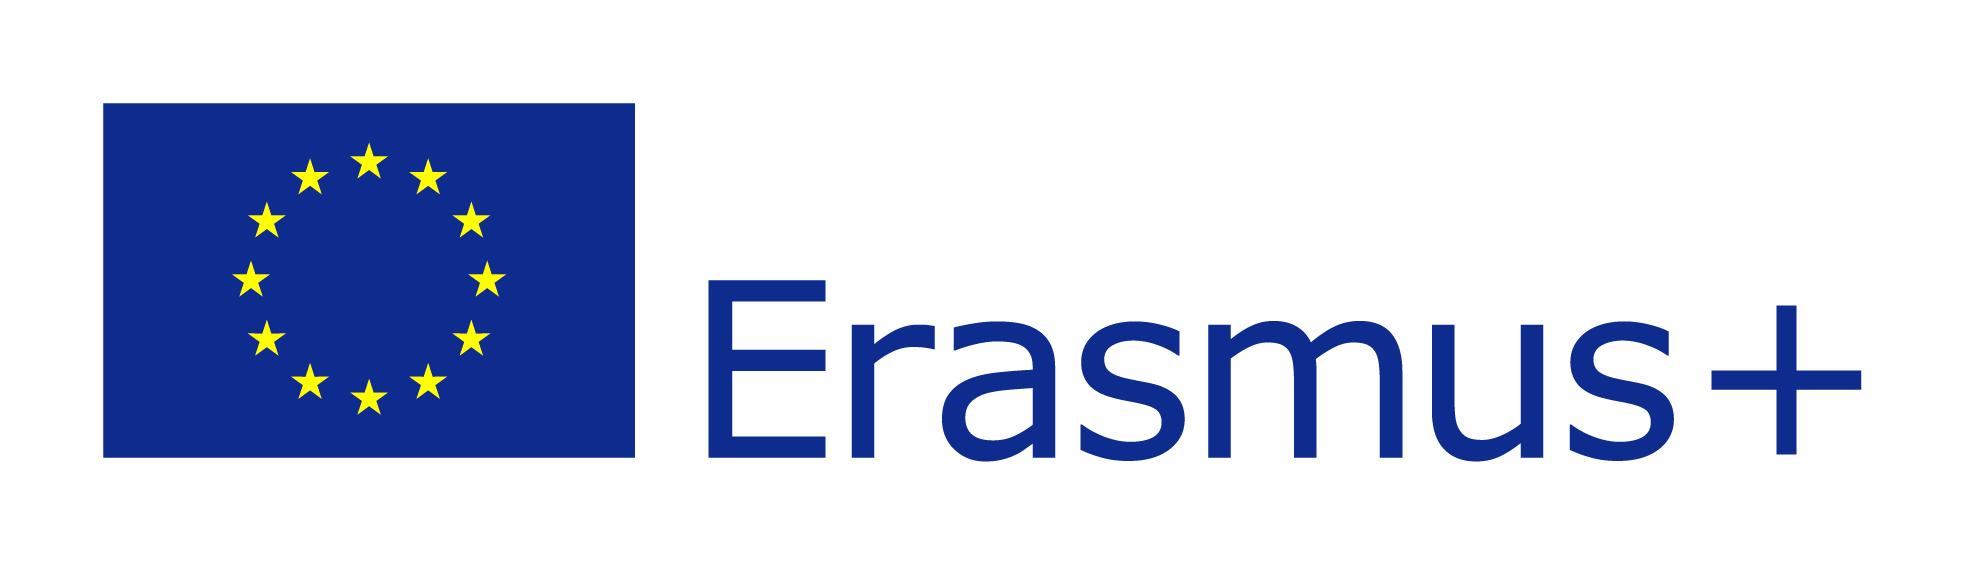 3.2. EU flag Erasmus vect POS